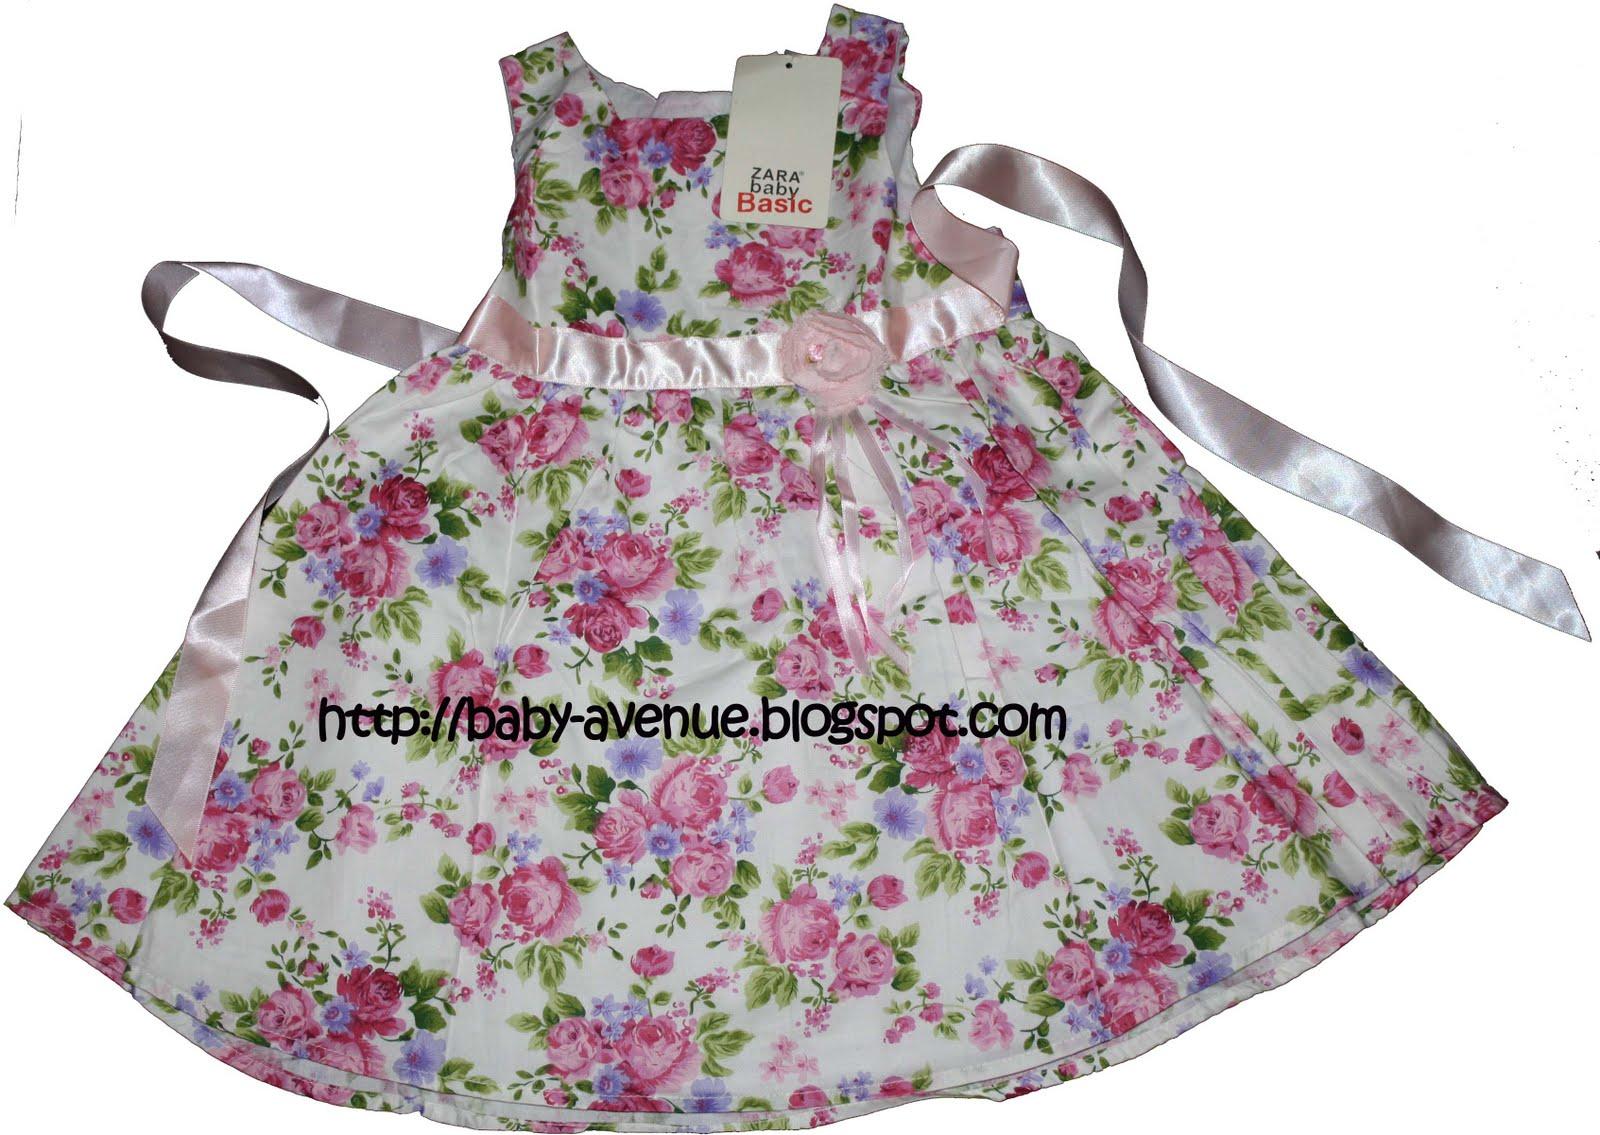 Baby Avenue Little Girl